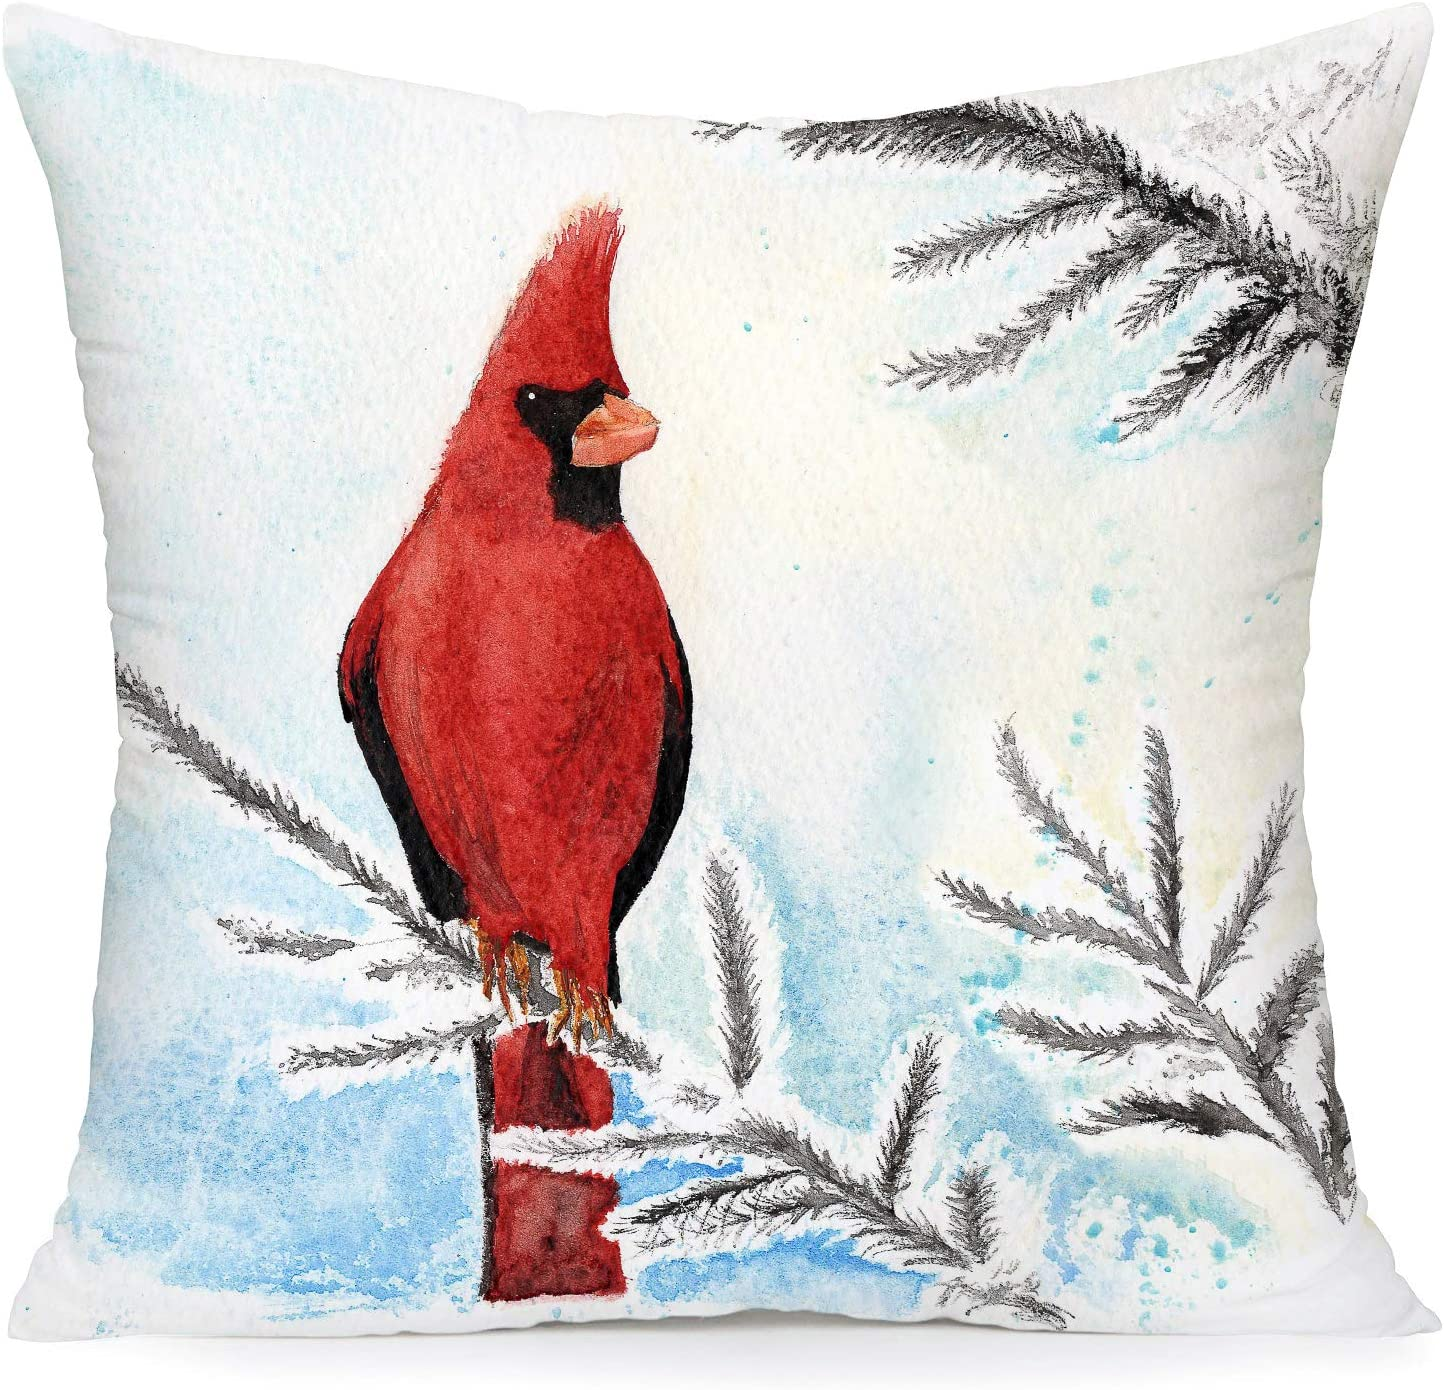 Amazon Com Royalours Pillow Covers Cardinal Snow Branch Pattern Super Soft Throw Pillow Case Cushion Cover Home Sofa Winter Red Bird Decorative Pillowcase 18 X 18 Inches Winter Bird2 Home Kitchen